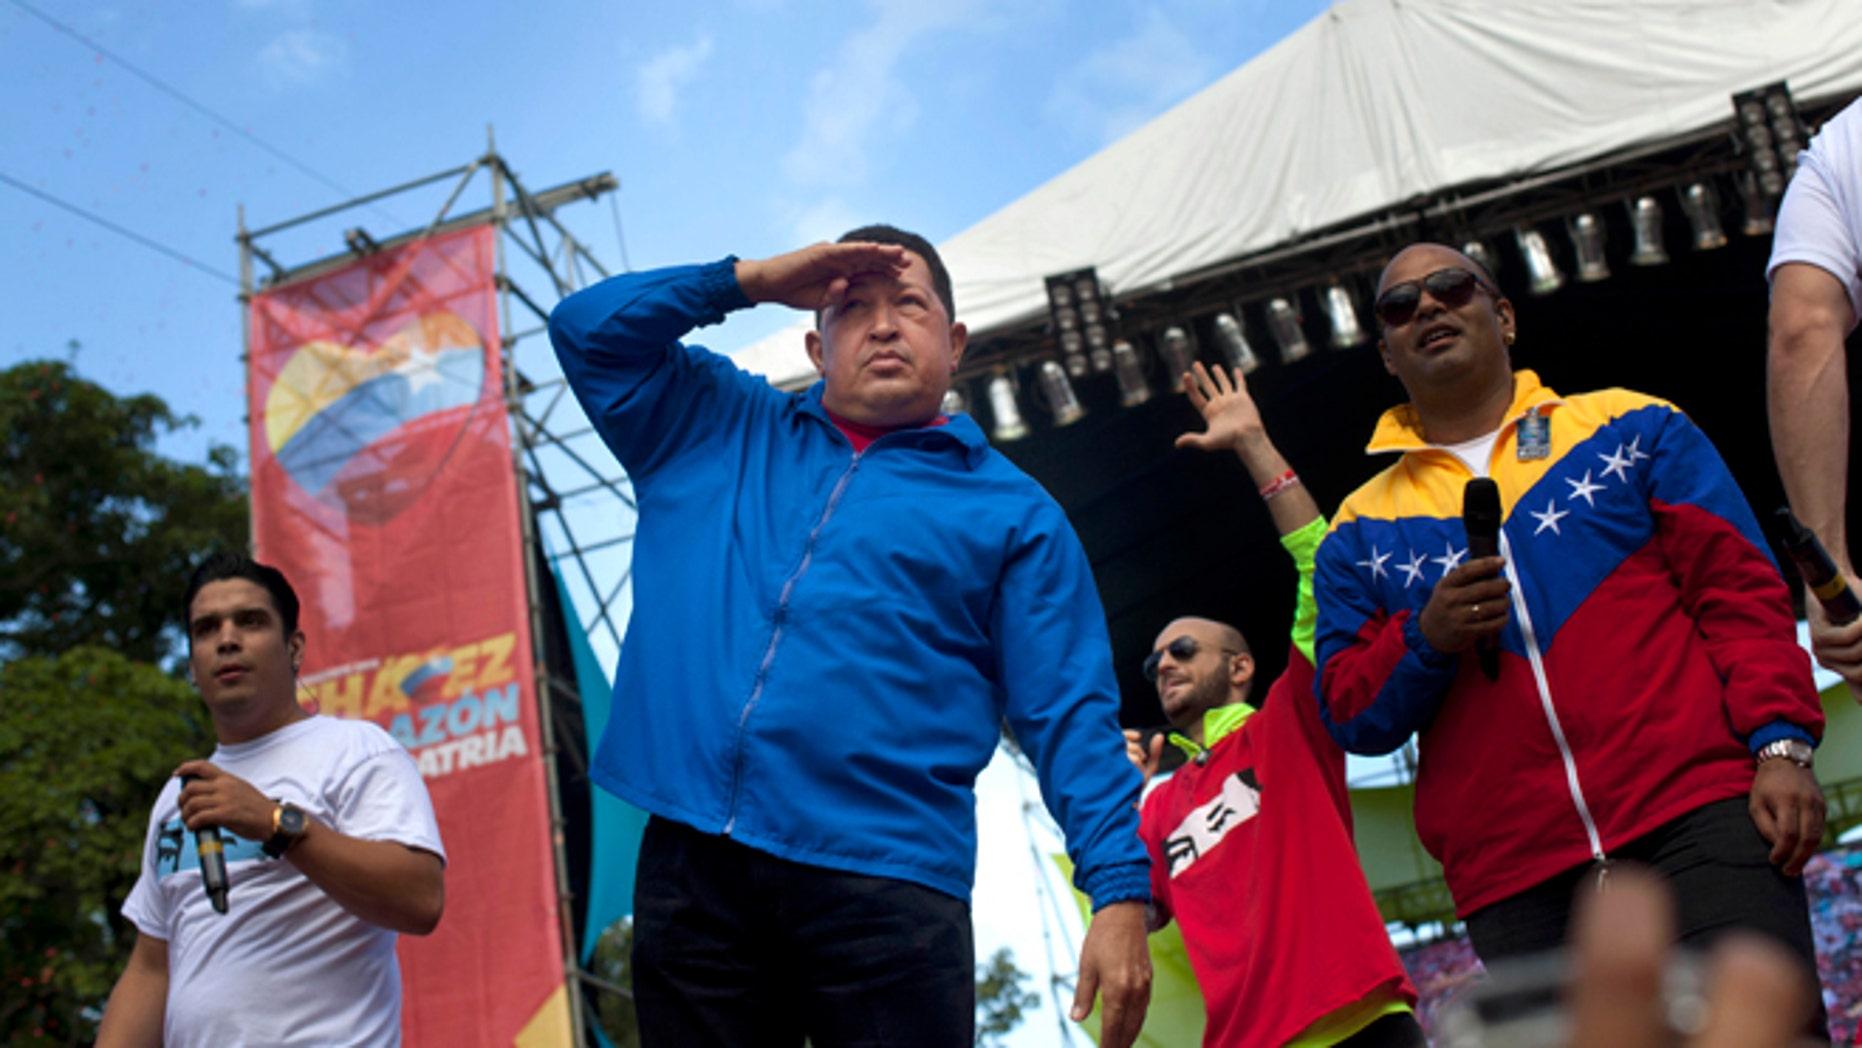 Oct. 3, 2012: Venezuela's President Hugo Chavez, front, gestures during a campaign rally in Maracay, Venezuela.